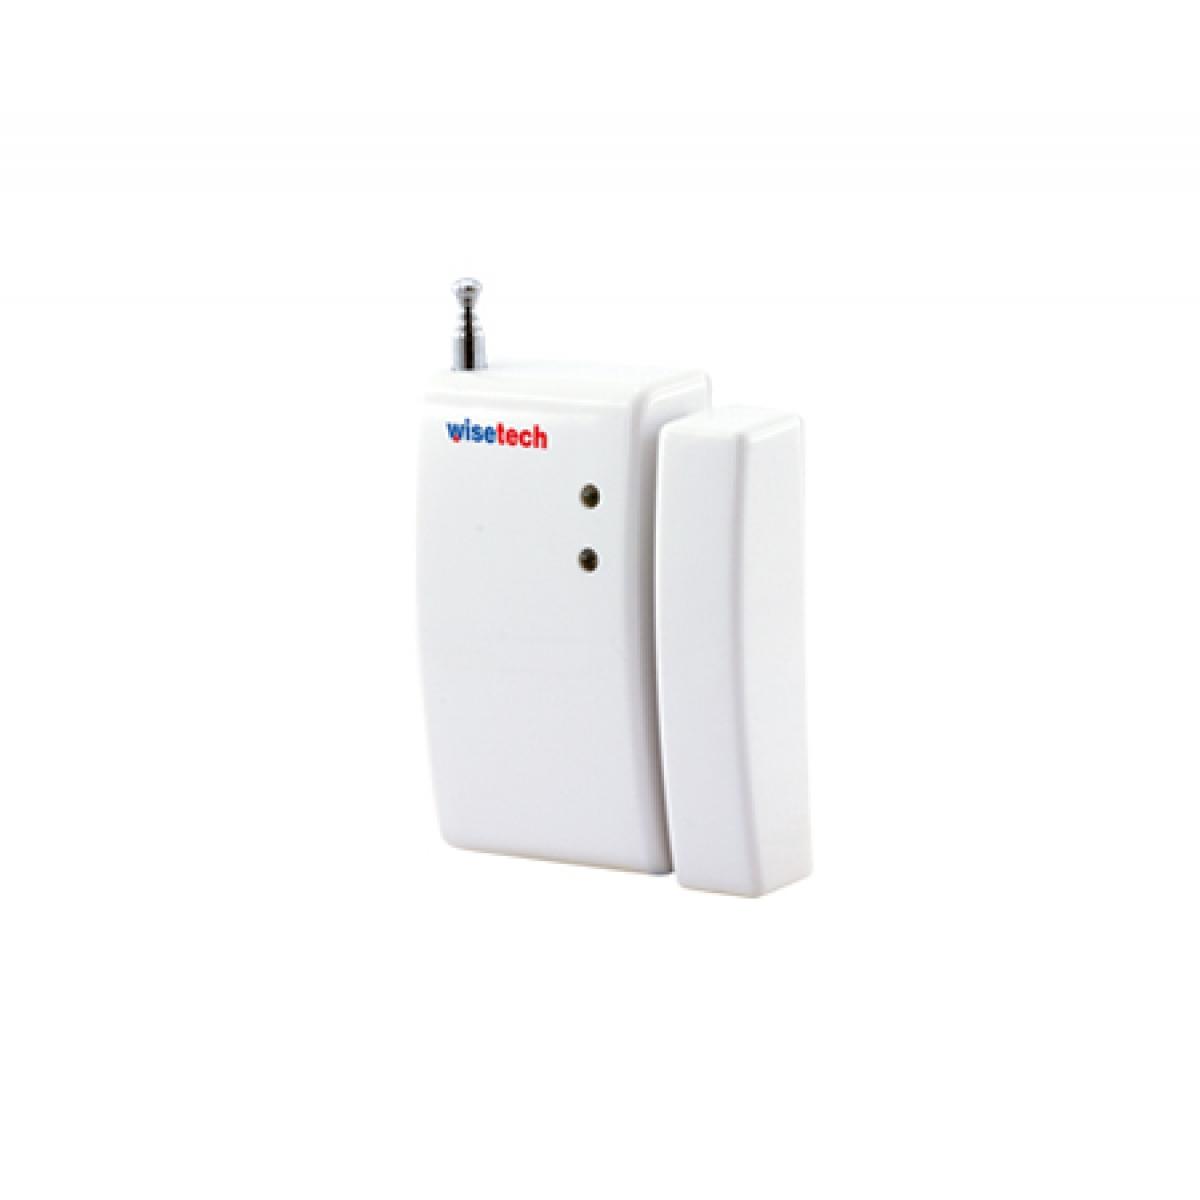 Wisetech WS-246 Antenli Kablosuz Kapı Pencere Alarmı